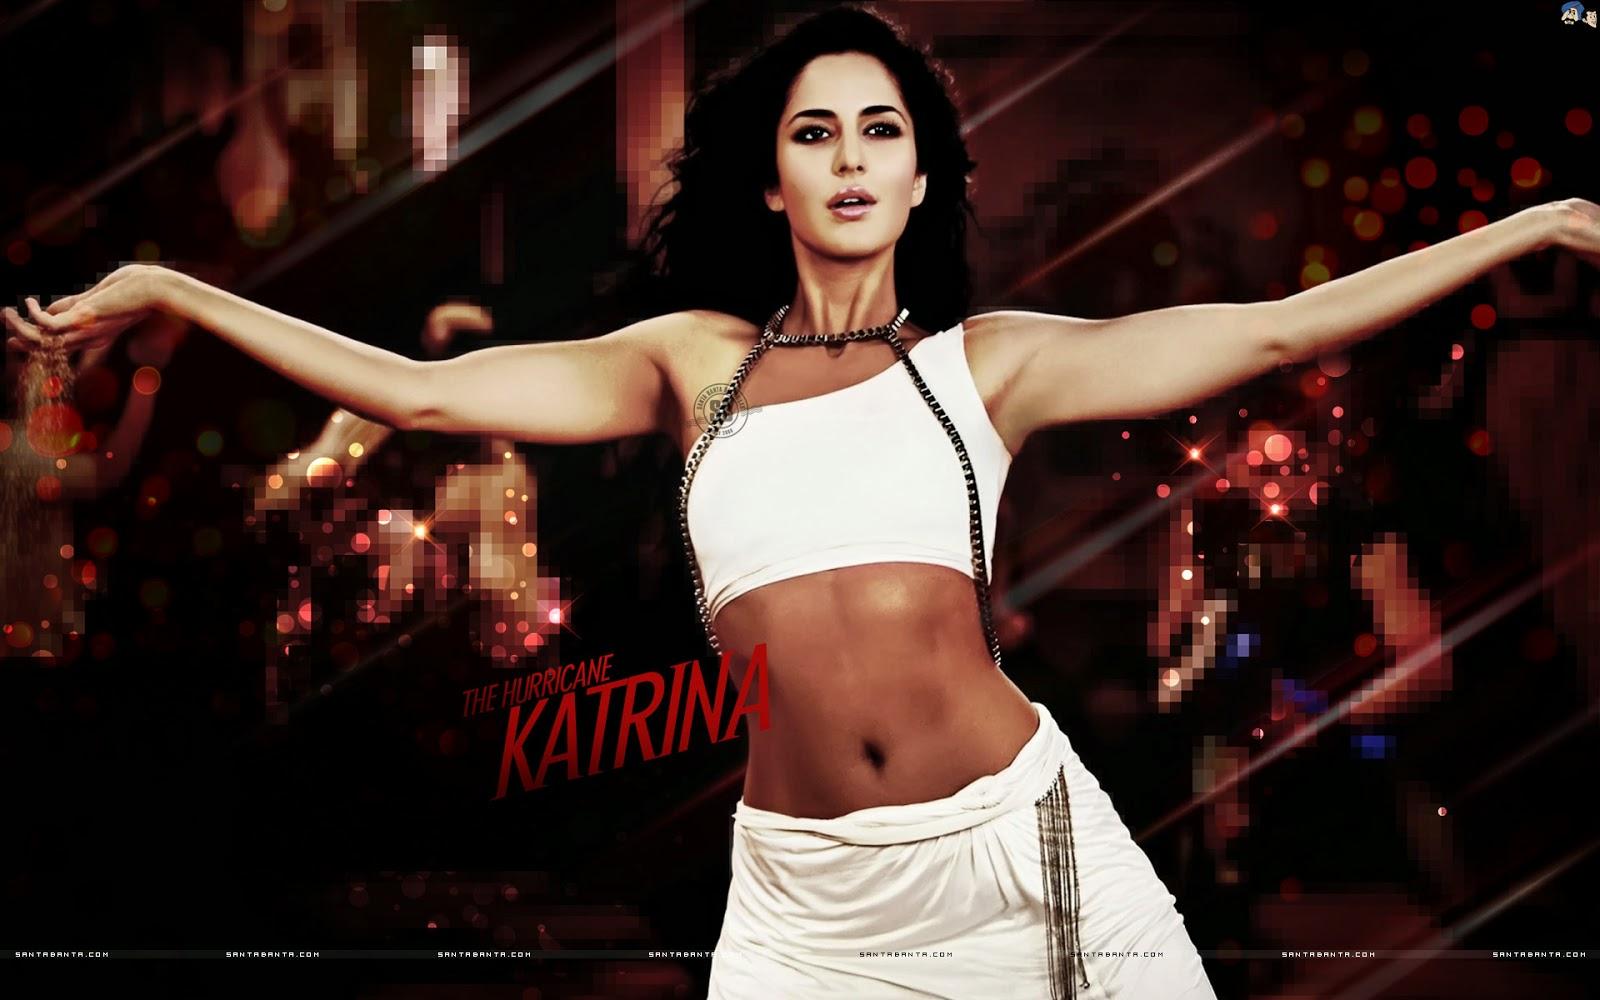 Katrina Kaif Seksi Wallpaper 10